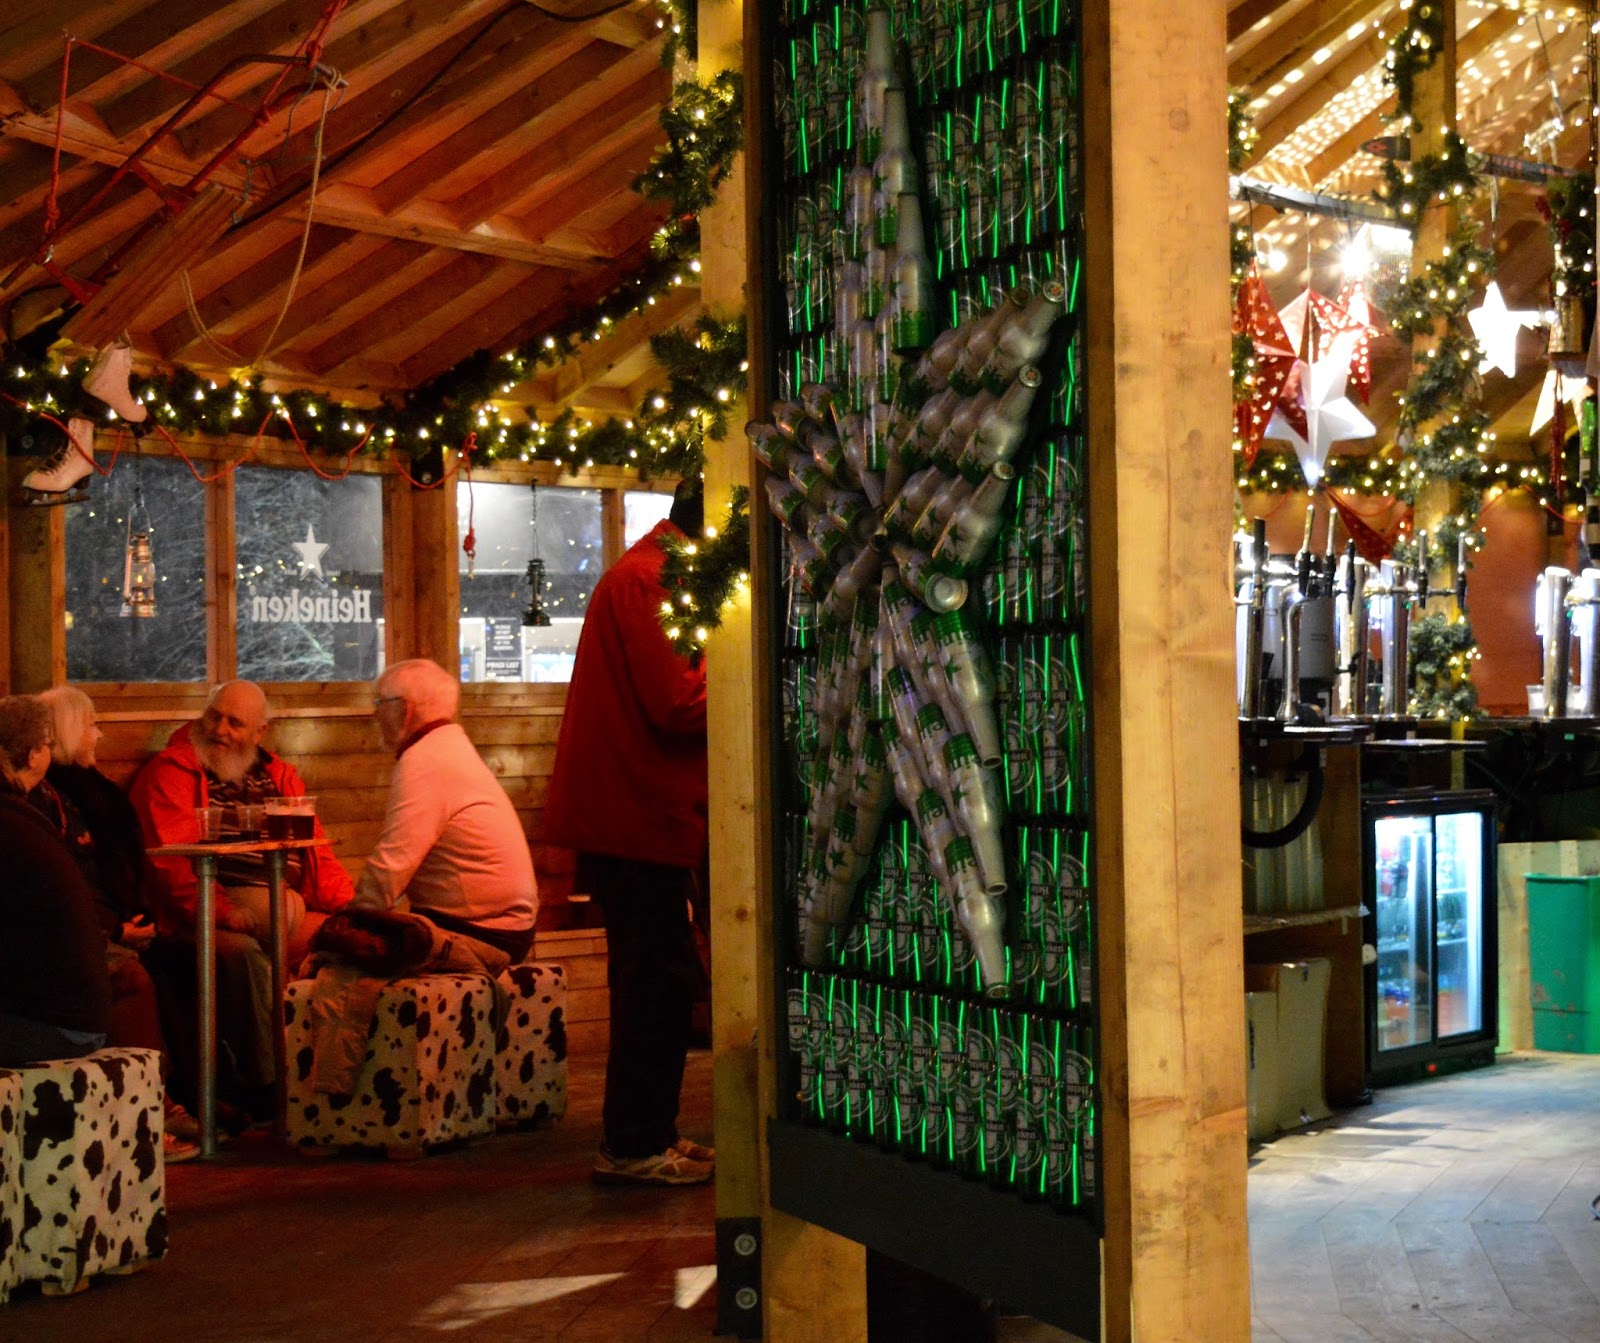 10 Reasons to Visit Edinburgh in December - Scandanavian bar near ice rink